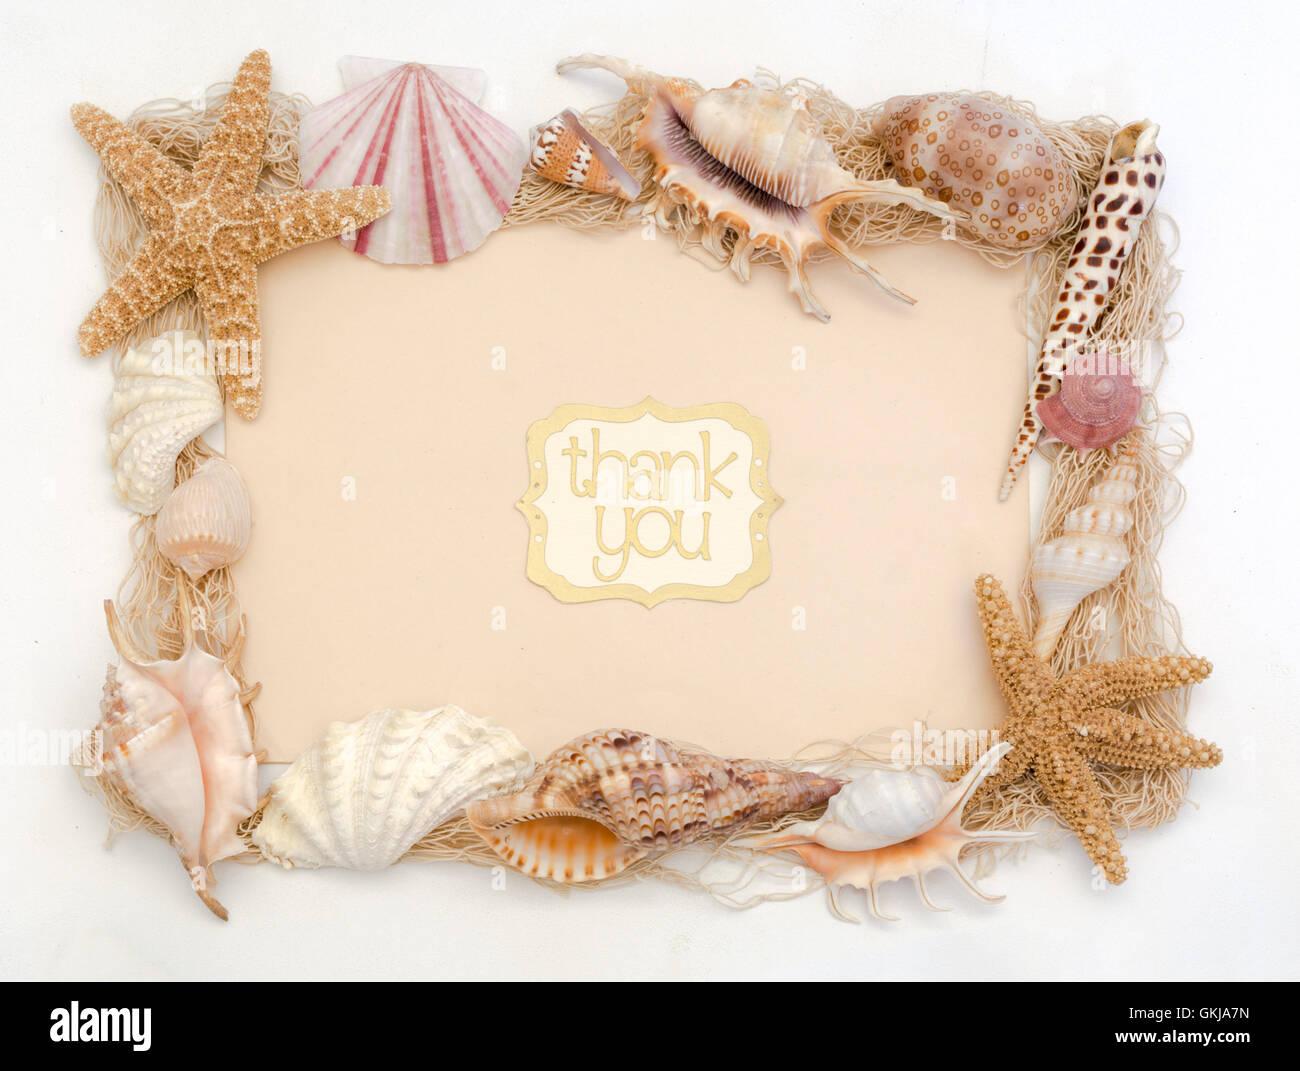 Beach shells thank you card stationery greeting stock photo beach shells thank you card stationery greeting kristyandbryce Choice Image